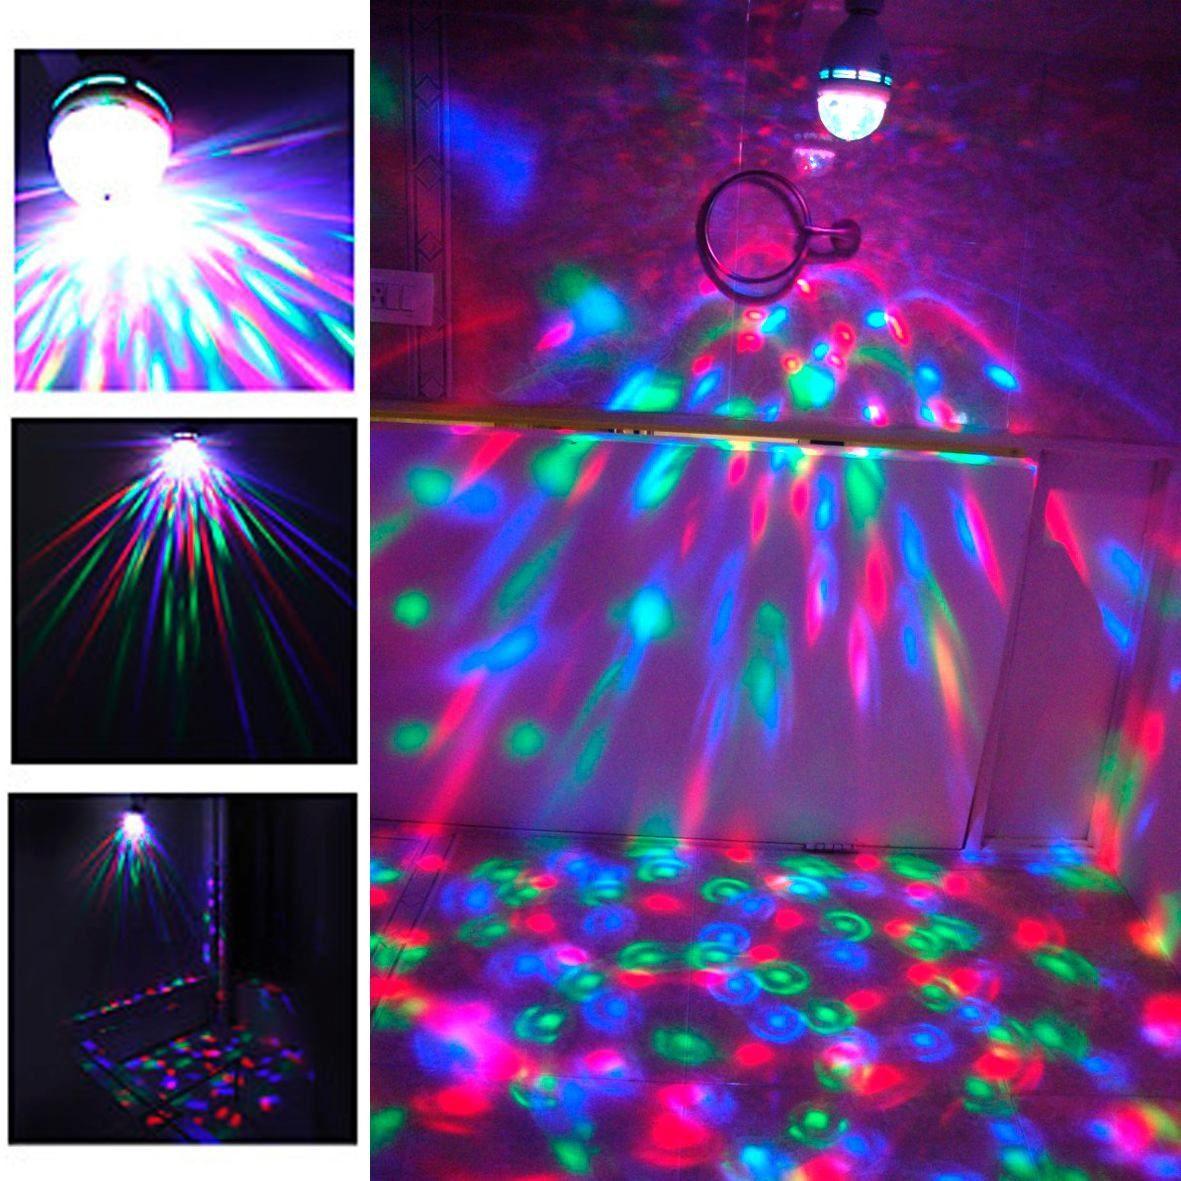 Foco led giratorio 3w rgb potente para fiestas a o nuevo s 19 99 en mercado libre - Focos led con luces de colores ...